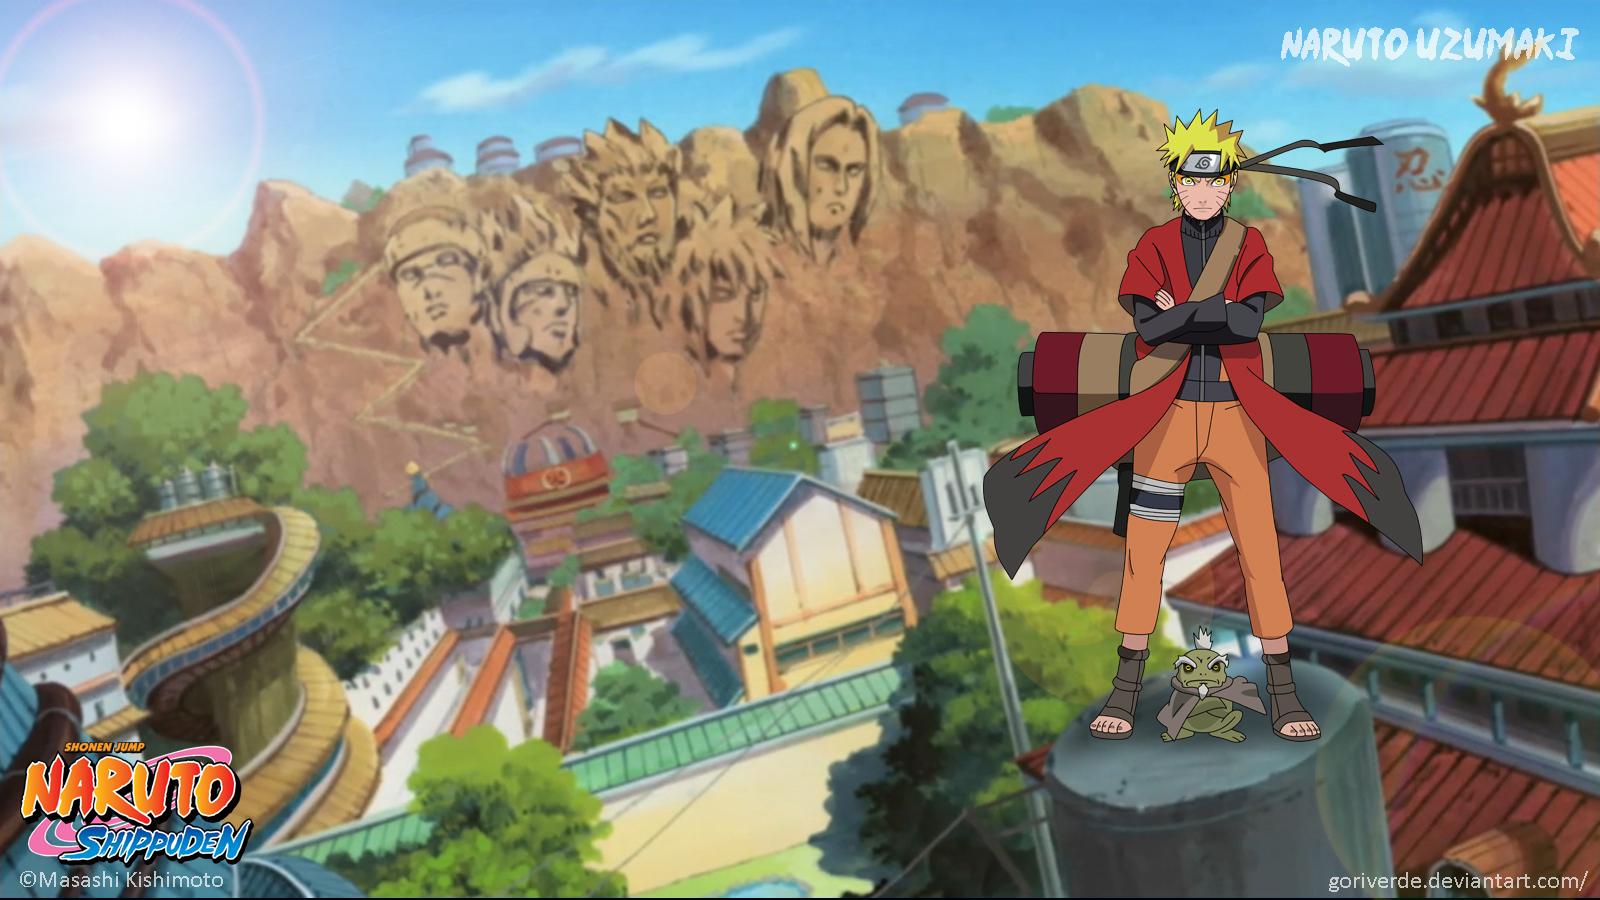 Naruto and Fukasaku by goriverde on DeviantArt